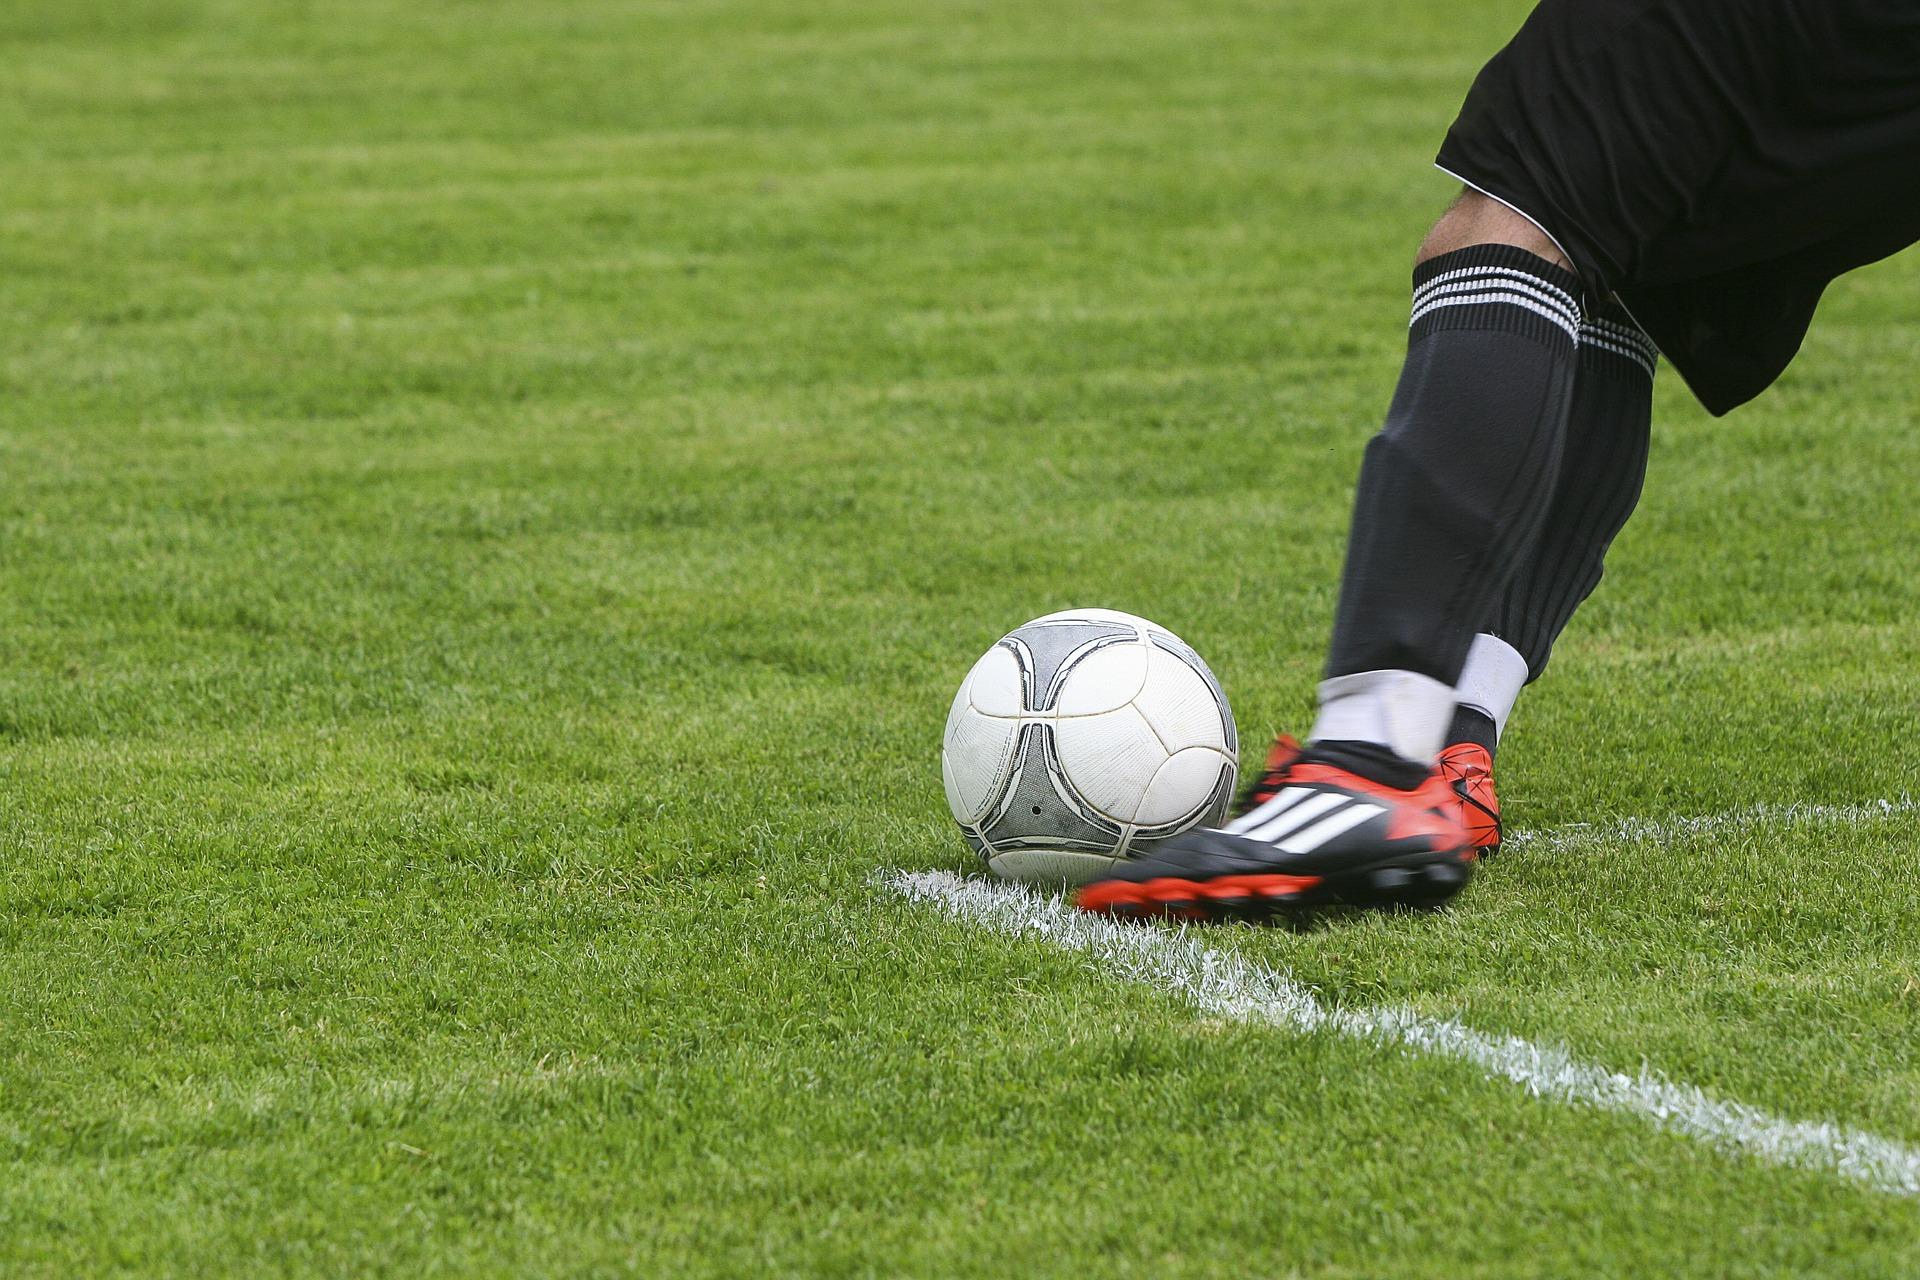 MEO junta-se finalmente ao acordo de partilha de conteúdos desportivos